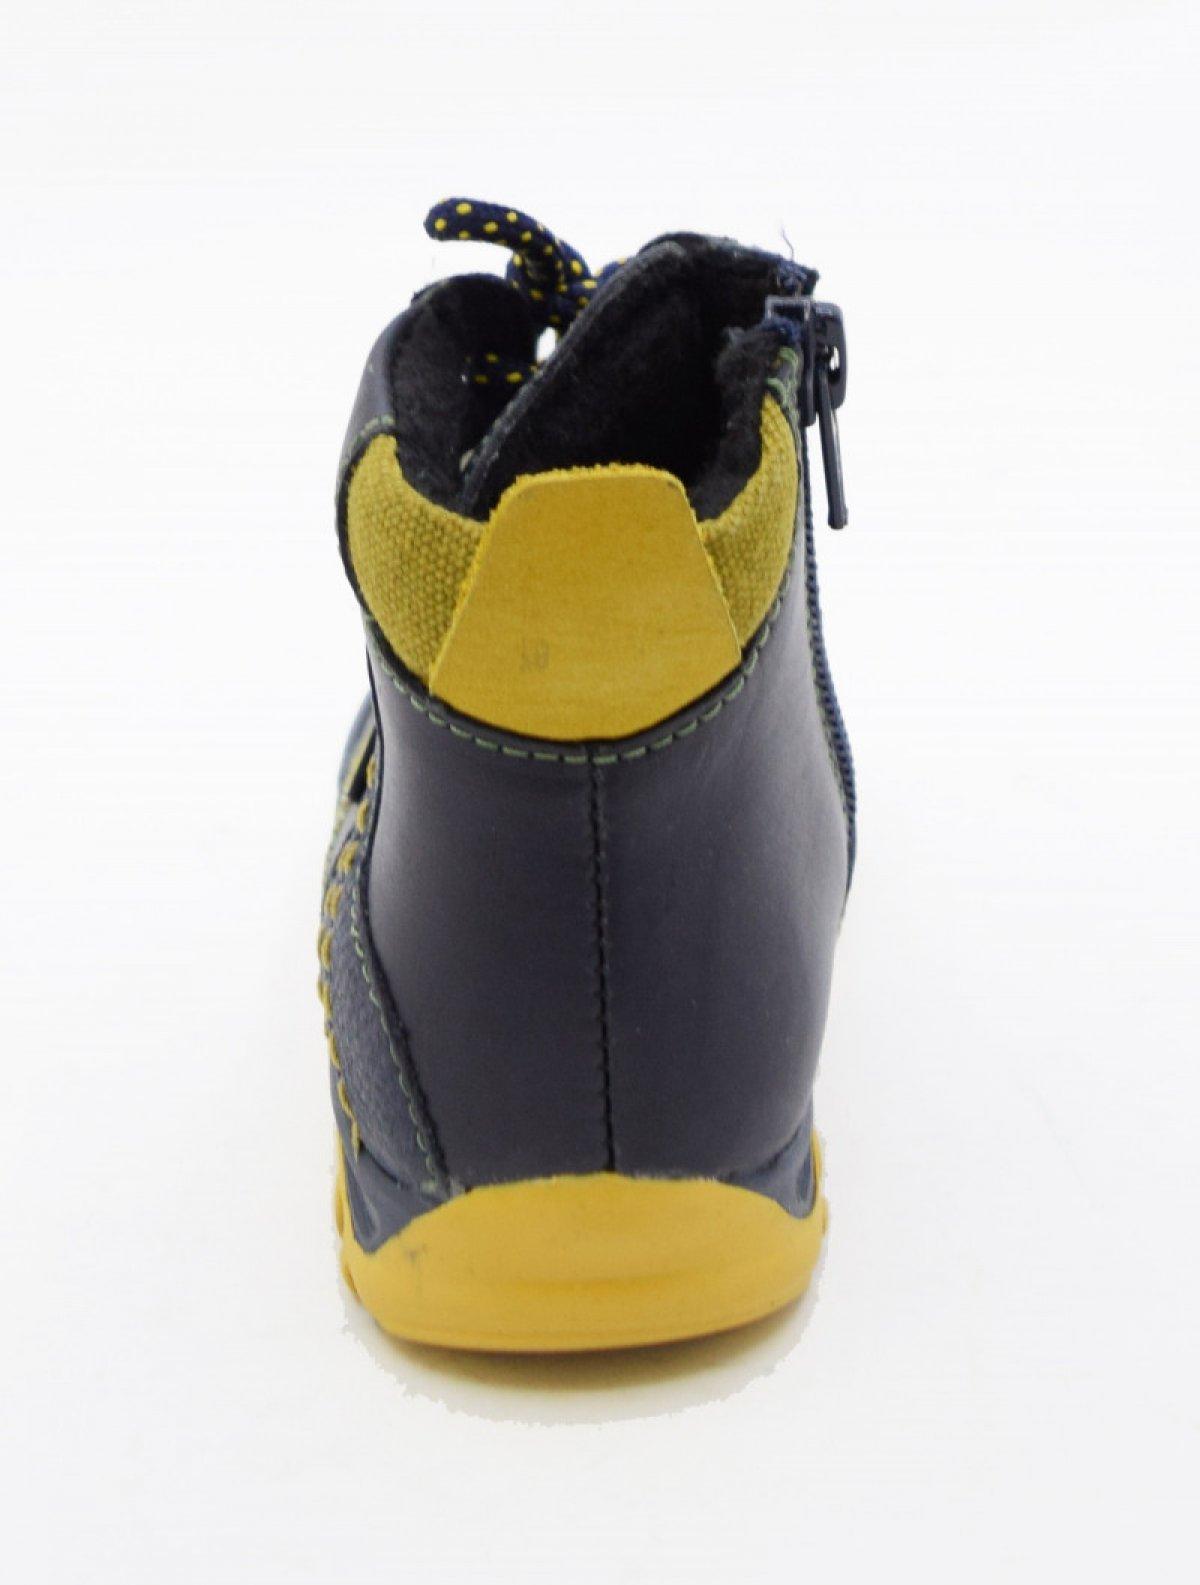 Котофей 152007-31 ботинки д/мальчика